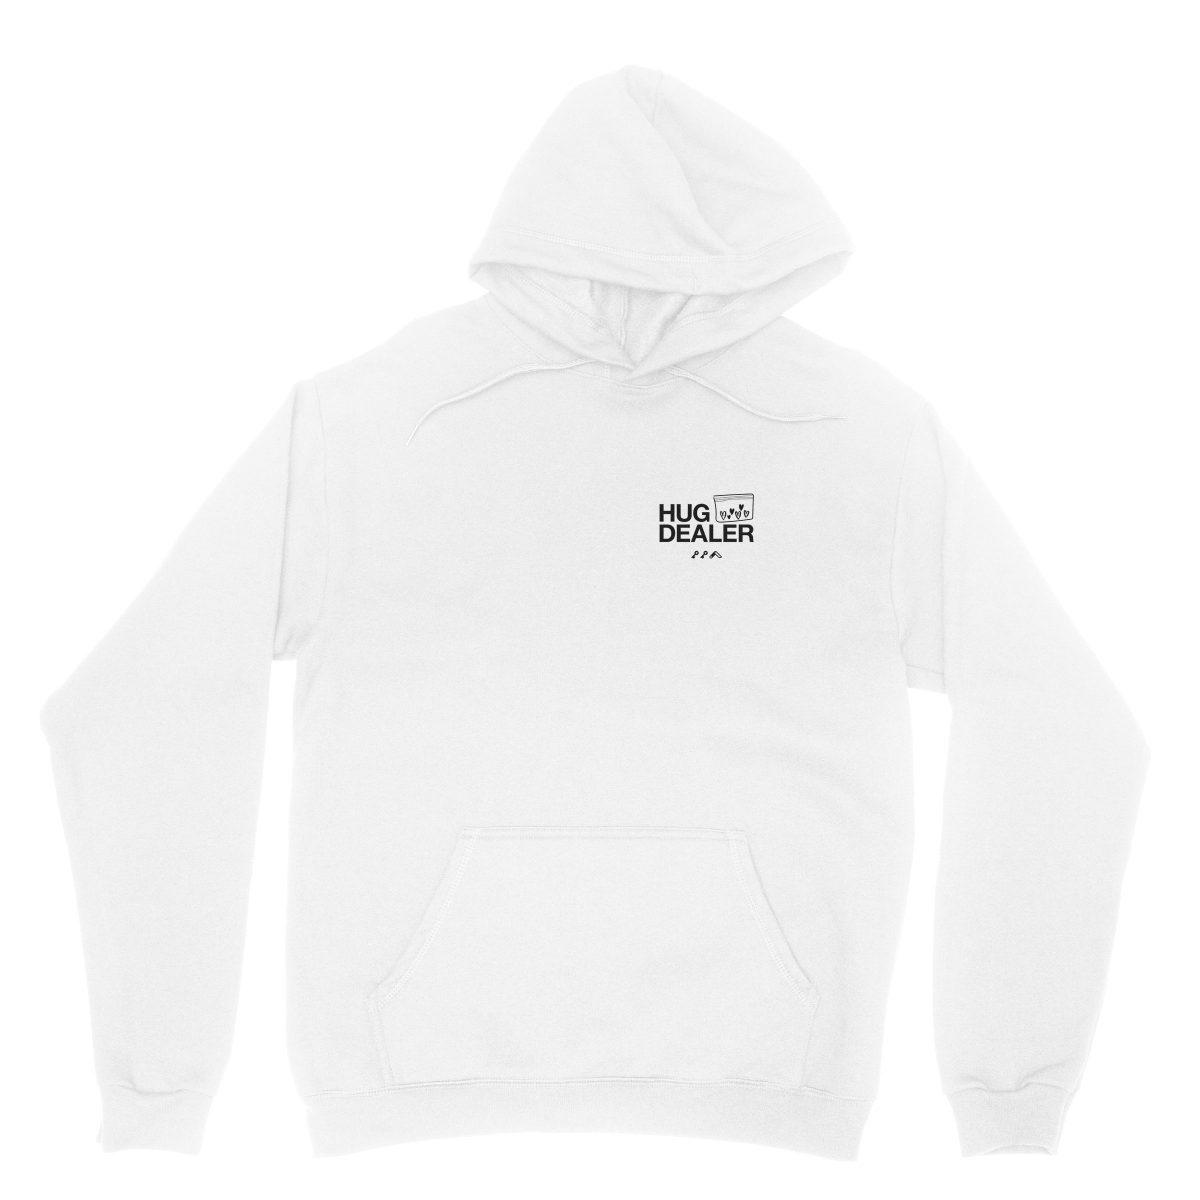 HUG DEALER hoodie in white by kikicutt sweatshirt store